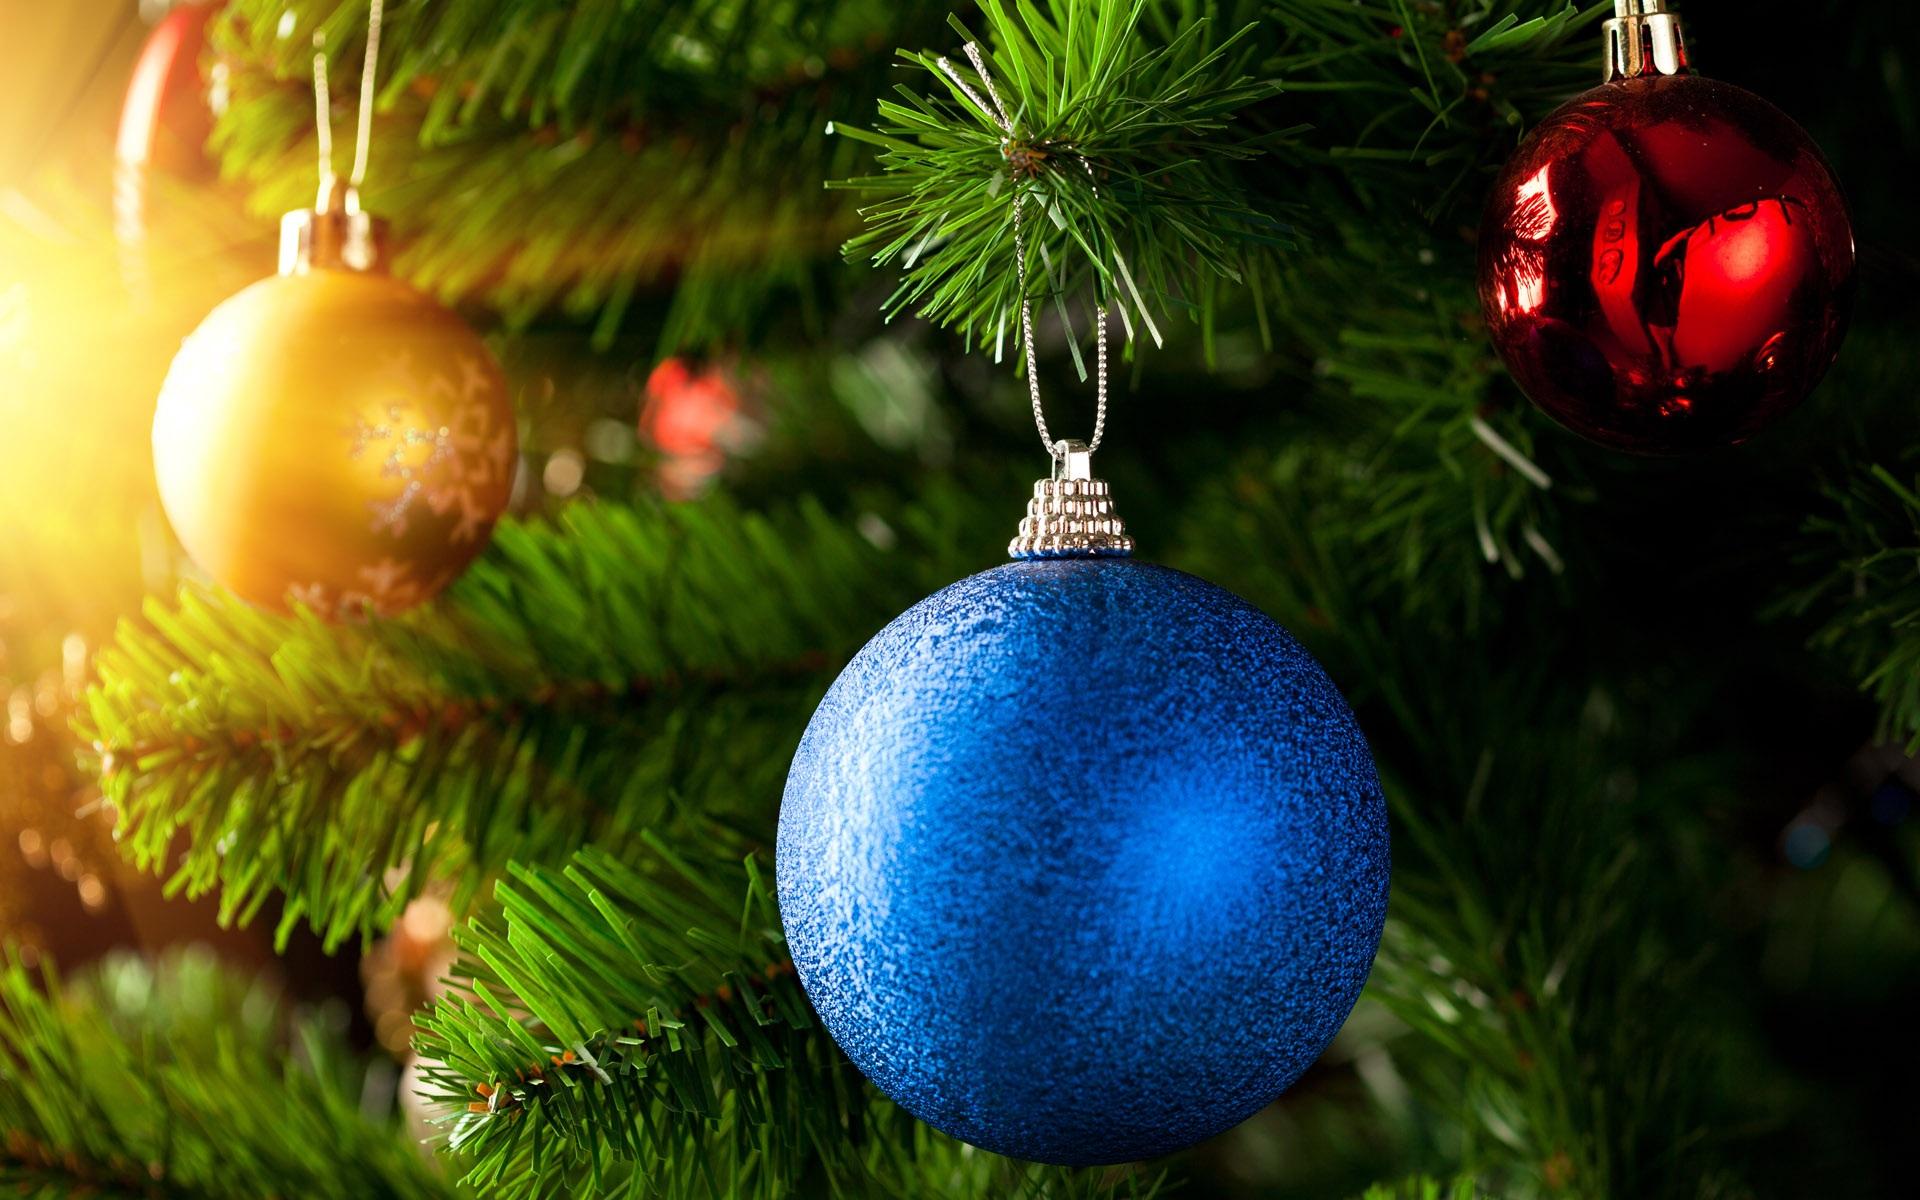 azul bola de navidad fondos de escritorio de vista previa